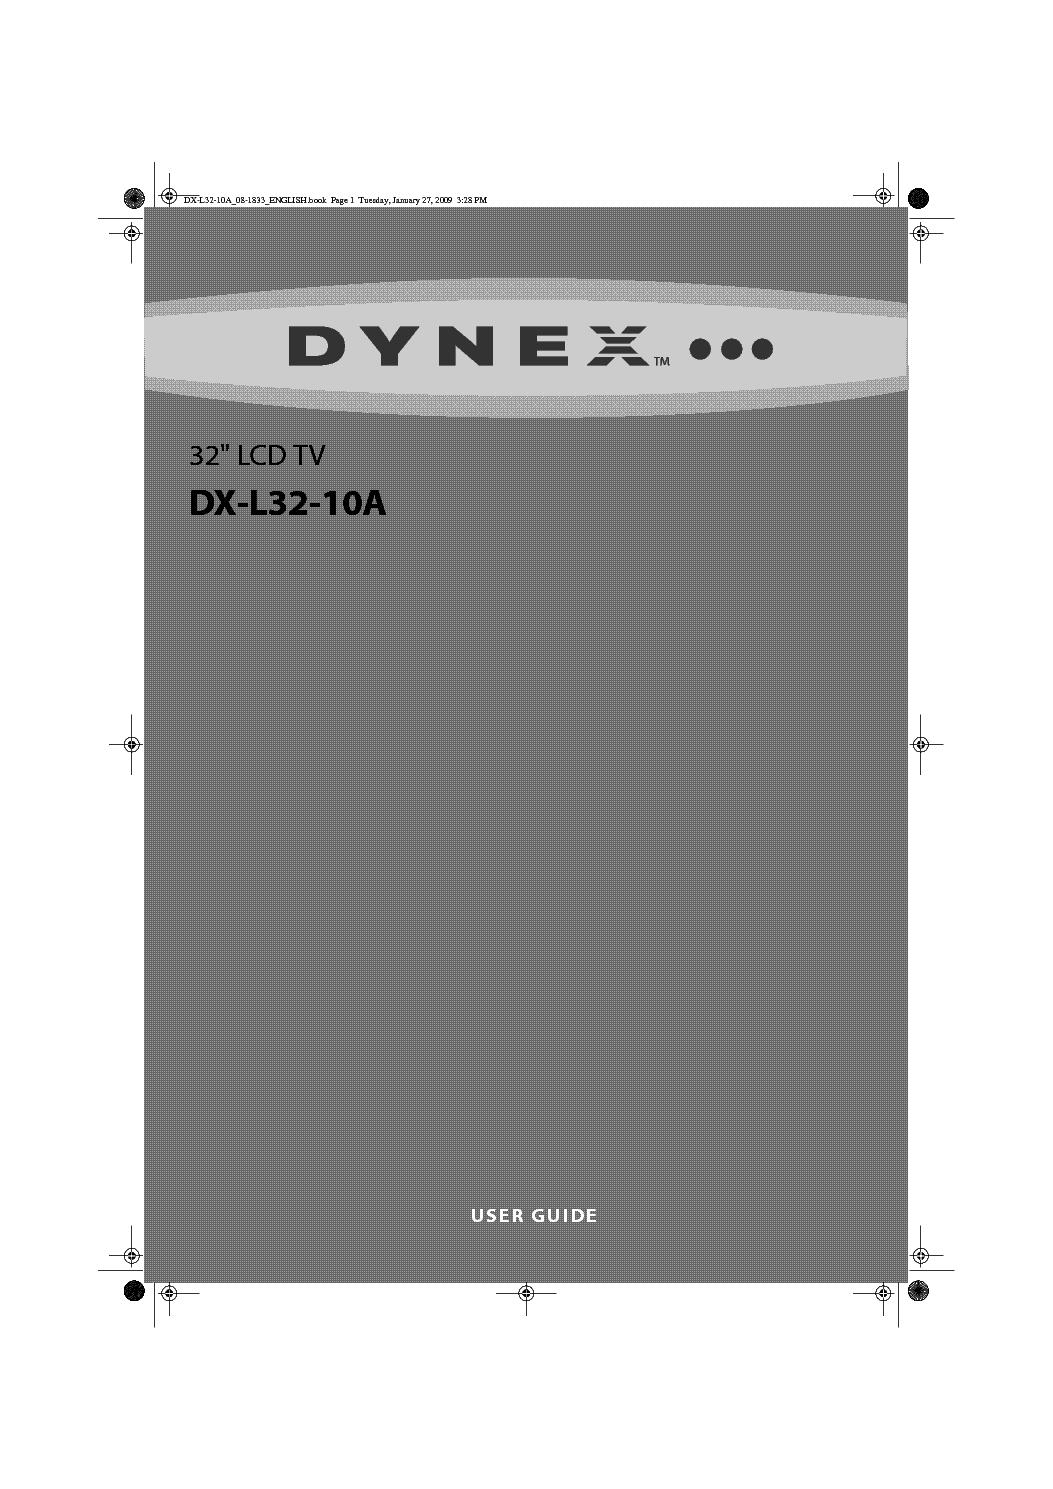 dynex dx l32 10a service manual download schematics eeprom repair rh elektrotanya com Dynex Remote Dynex Wireless Mouse